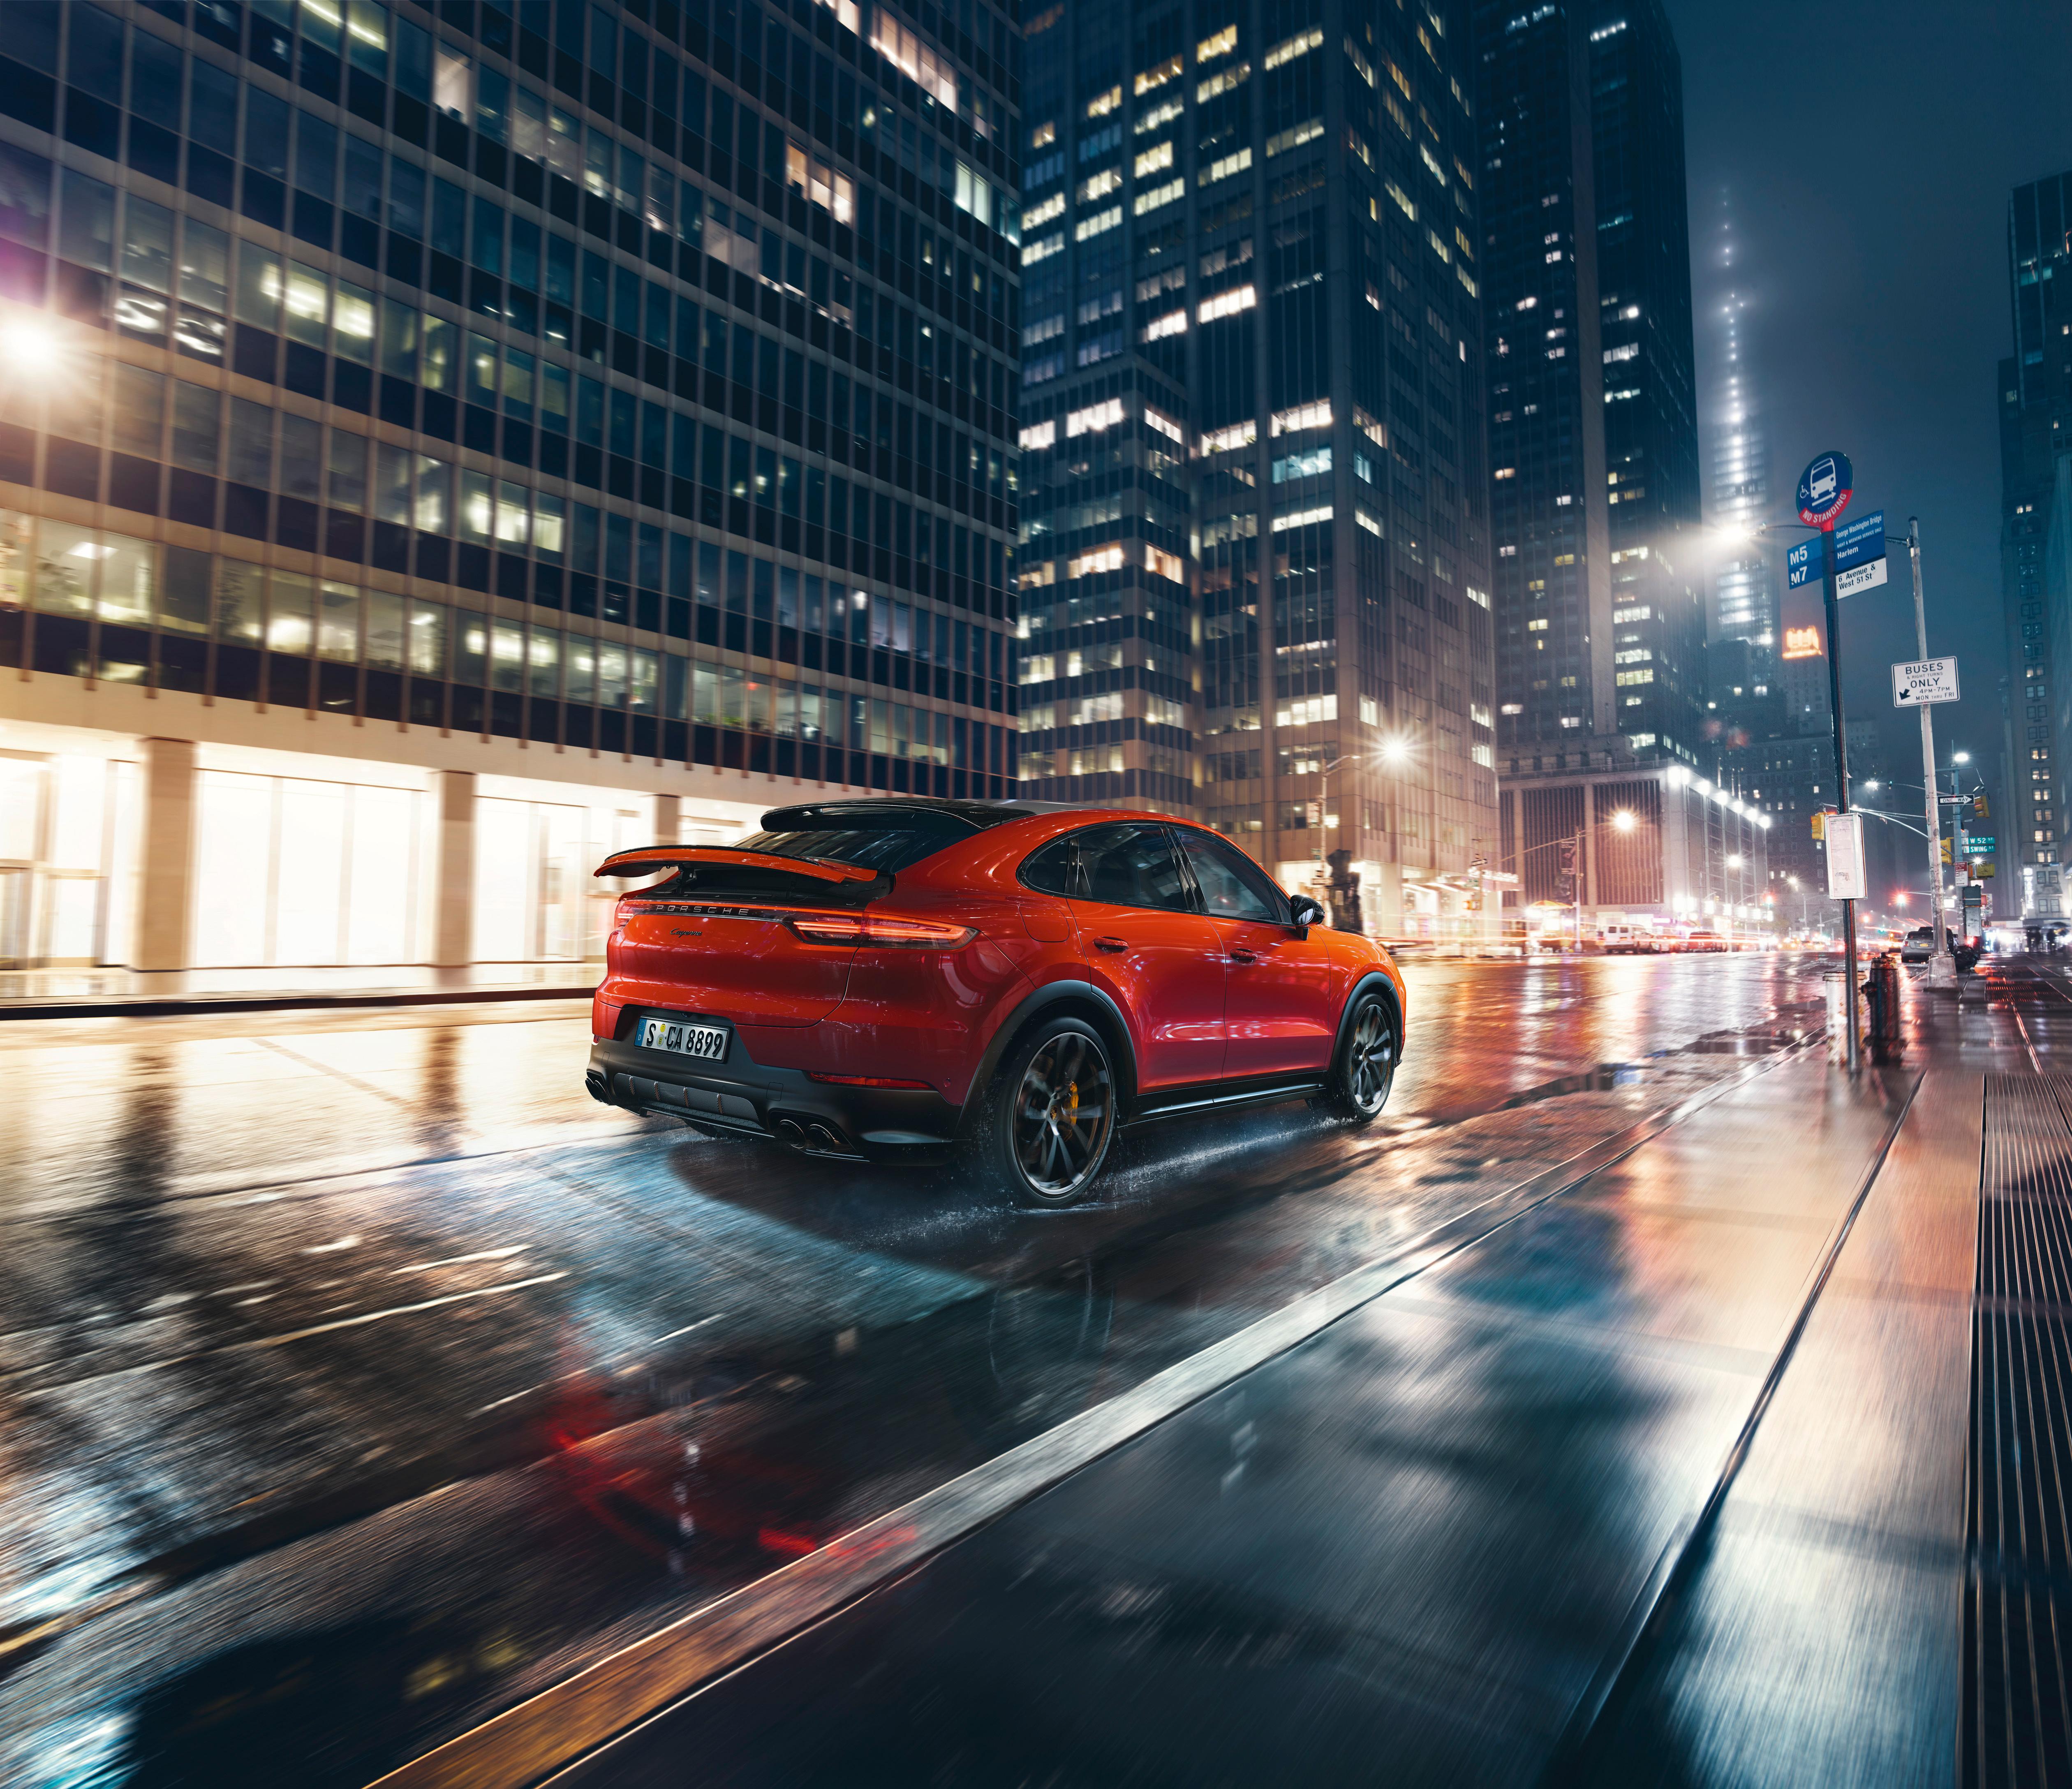 2560x1080 Porsche Cayenne Coupe 2019 5k 2560x1080